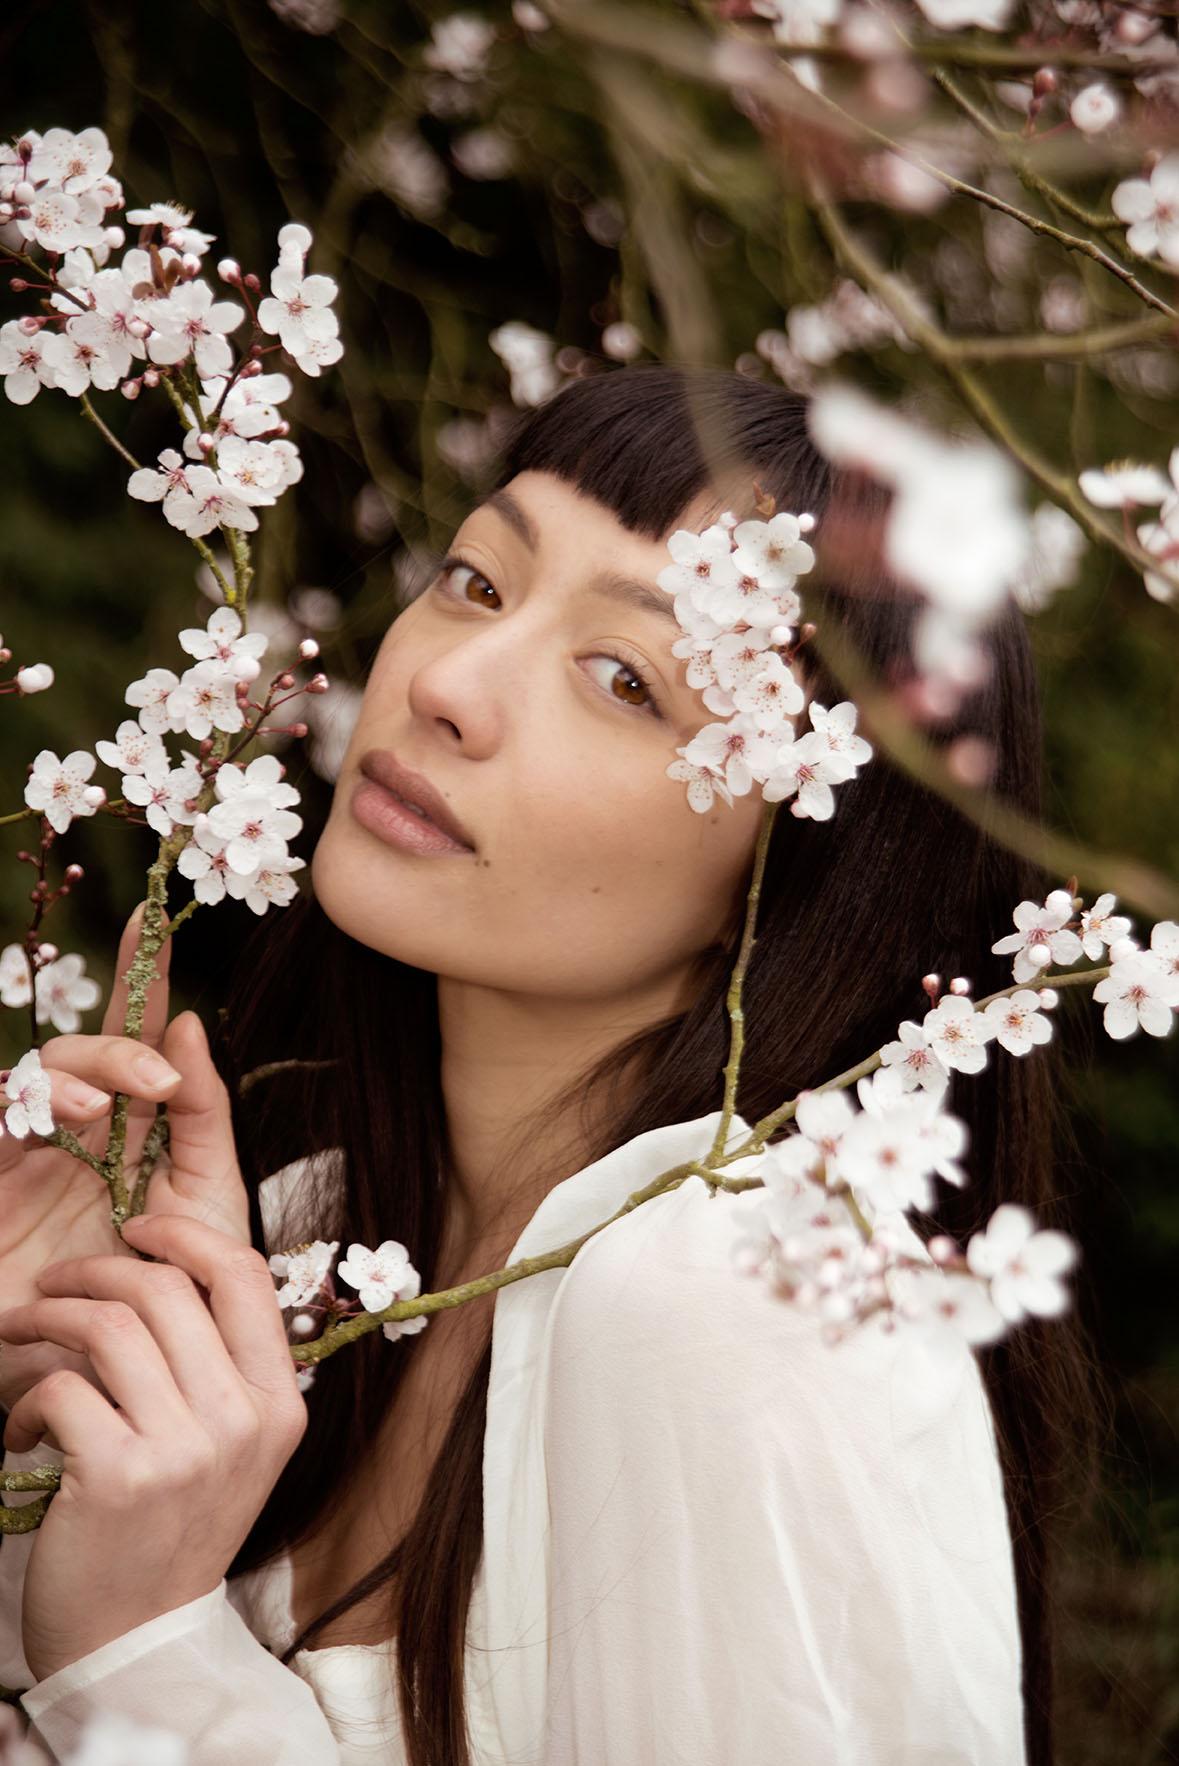 Fashion Flower Photoshoot Modelled by Mia Mokk By Grace Delnevo Cotswold fashion Photographer